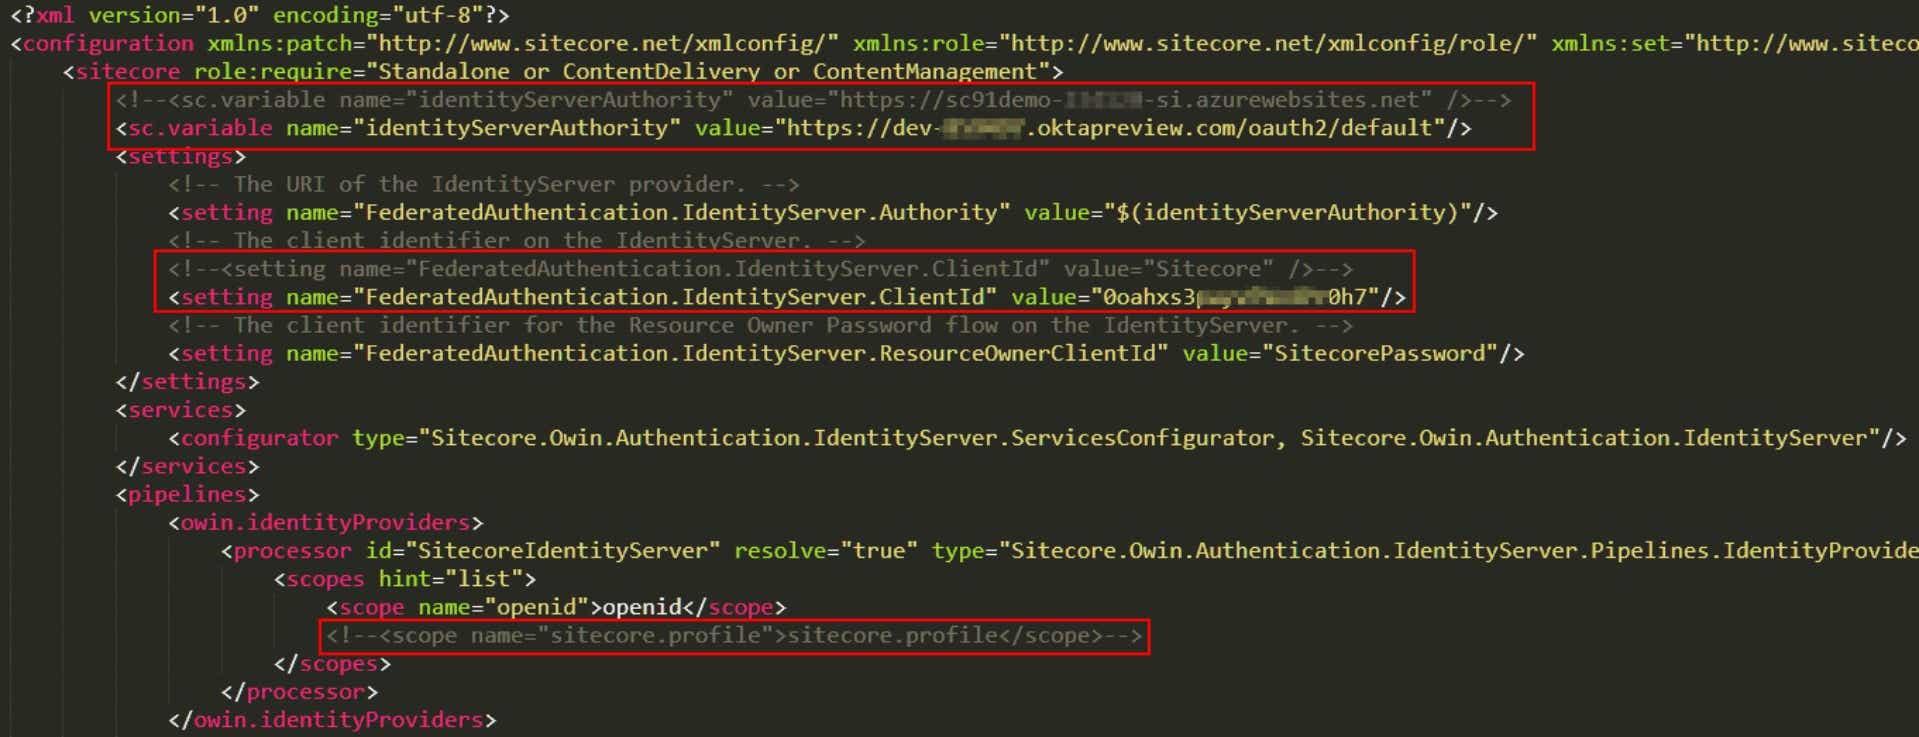 Adjust Sitecore Configuration to use Okta as Login Provider